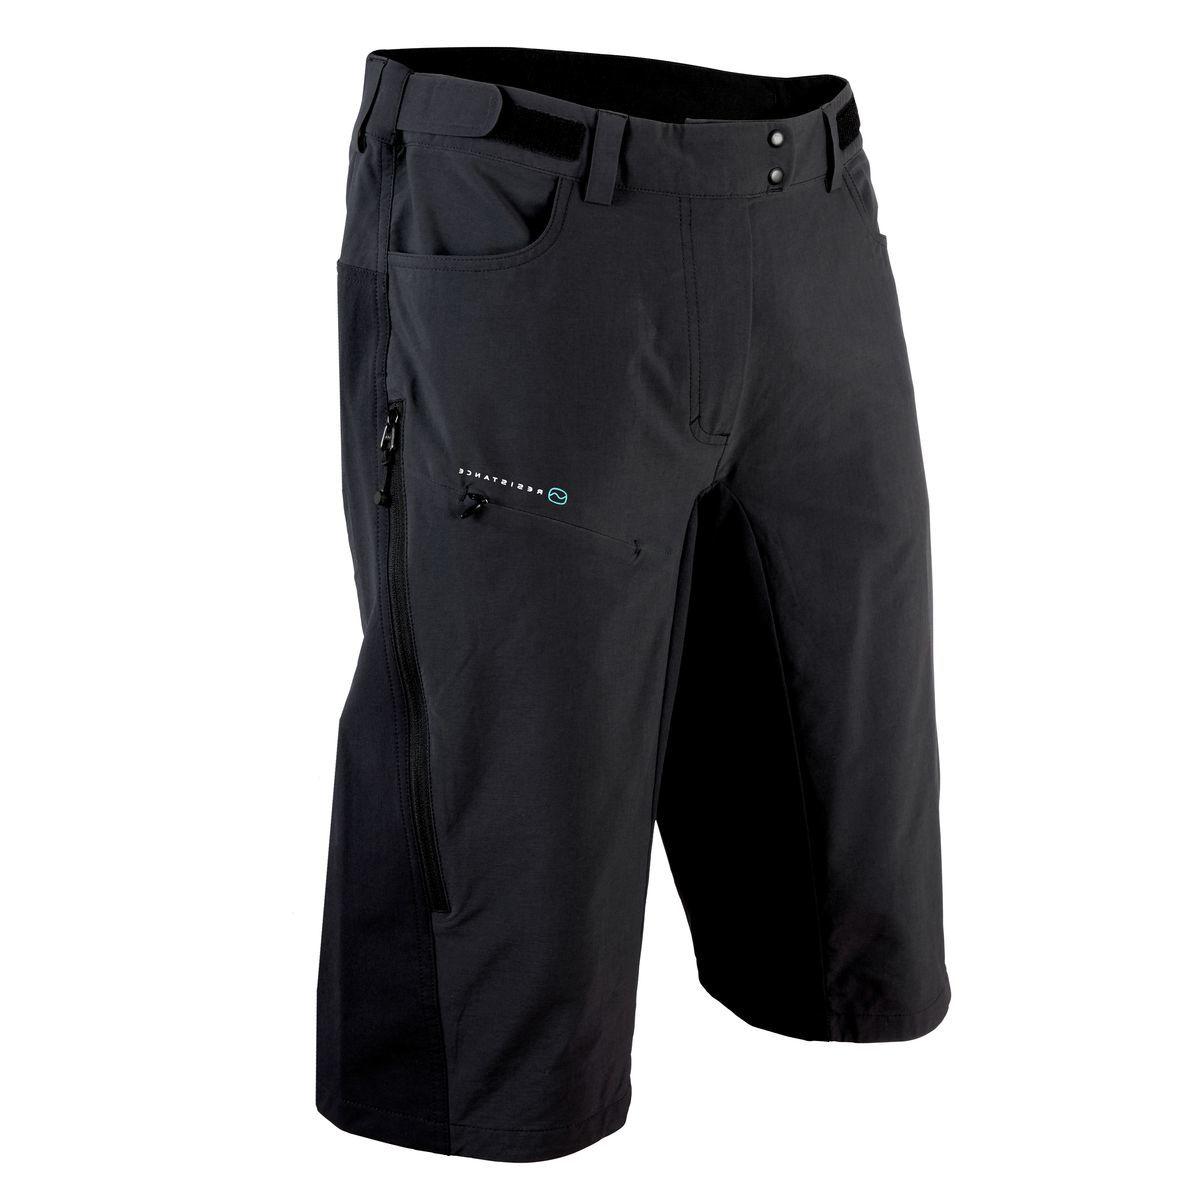 POC Resistance Enduro Mid Short - Men's